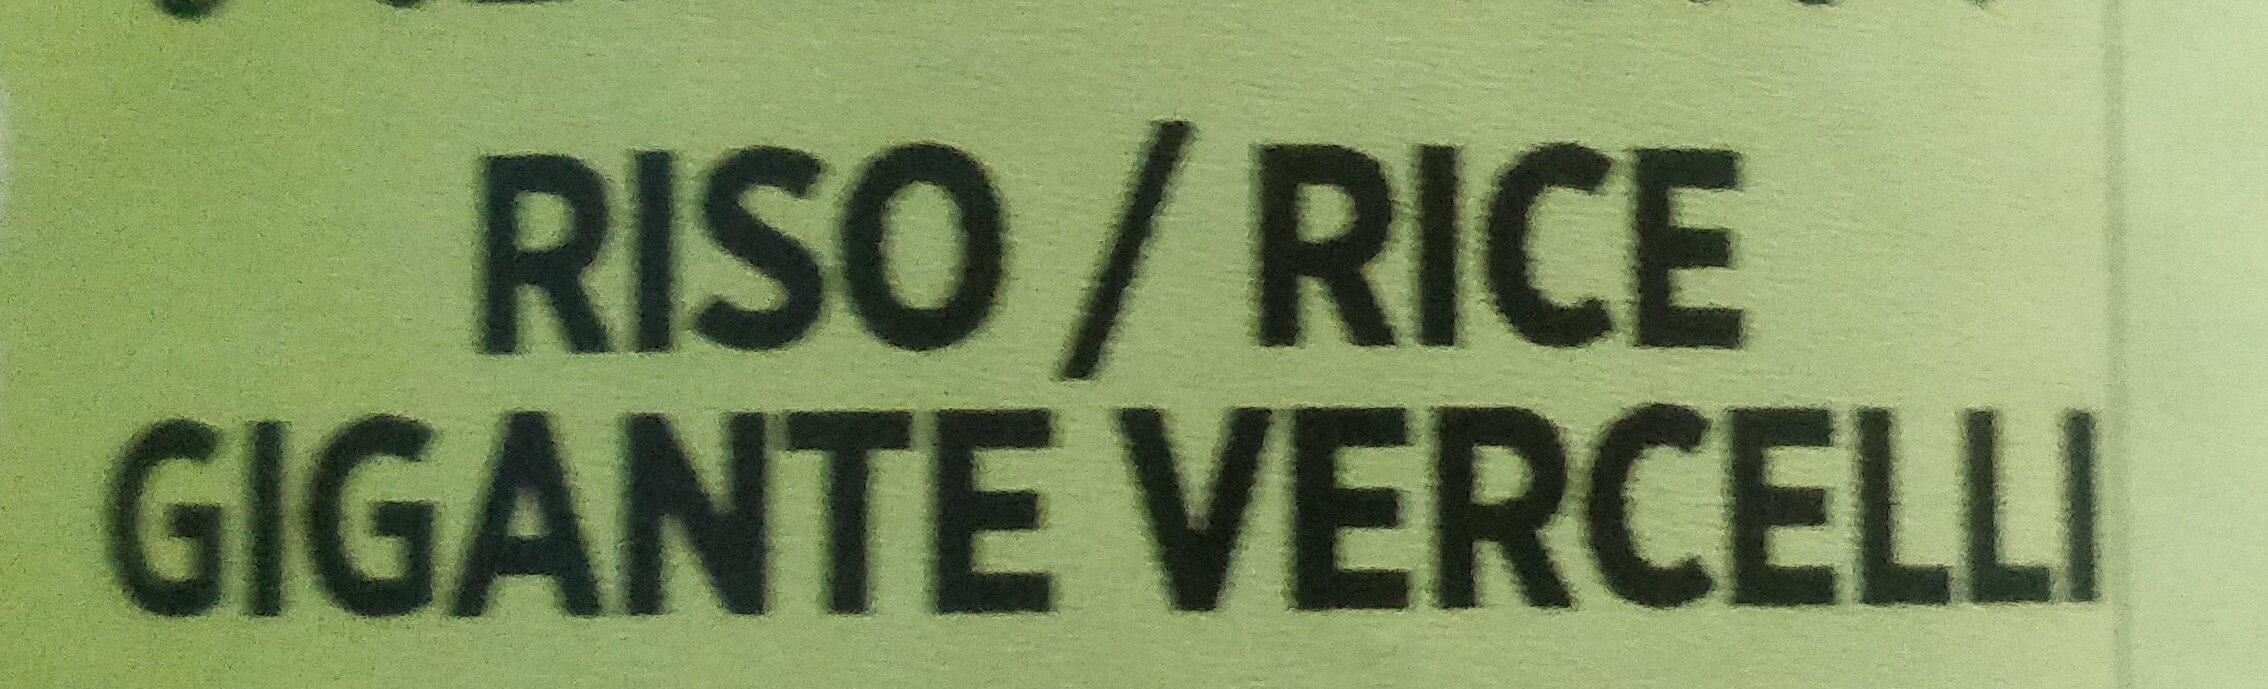 Riso gigante Vercelli - Ingredients - it